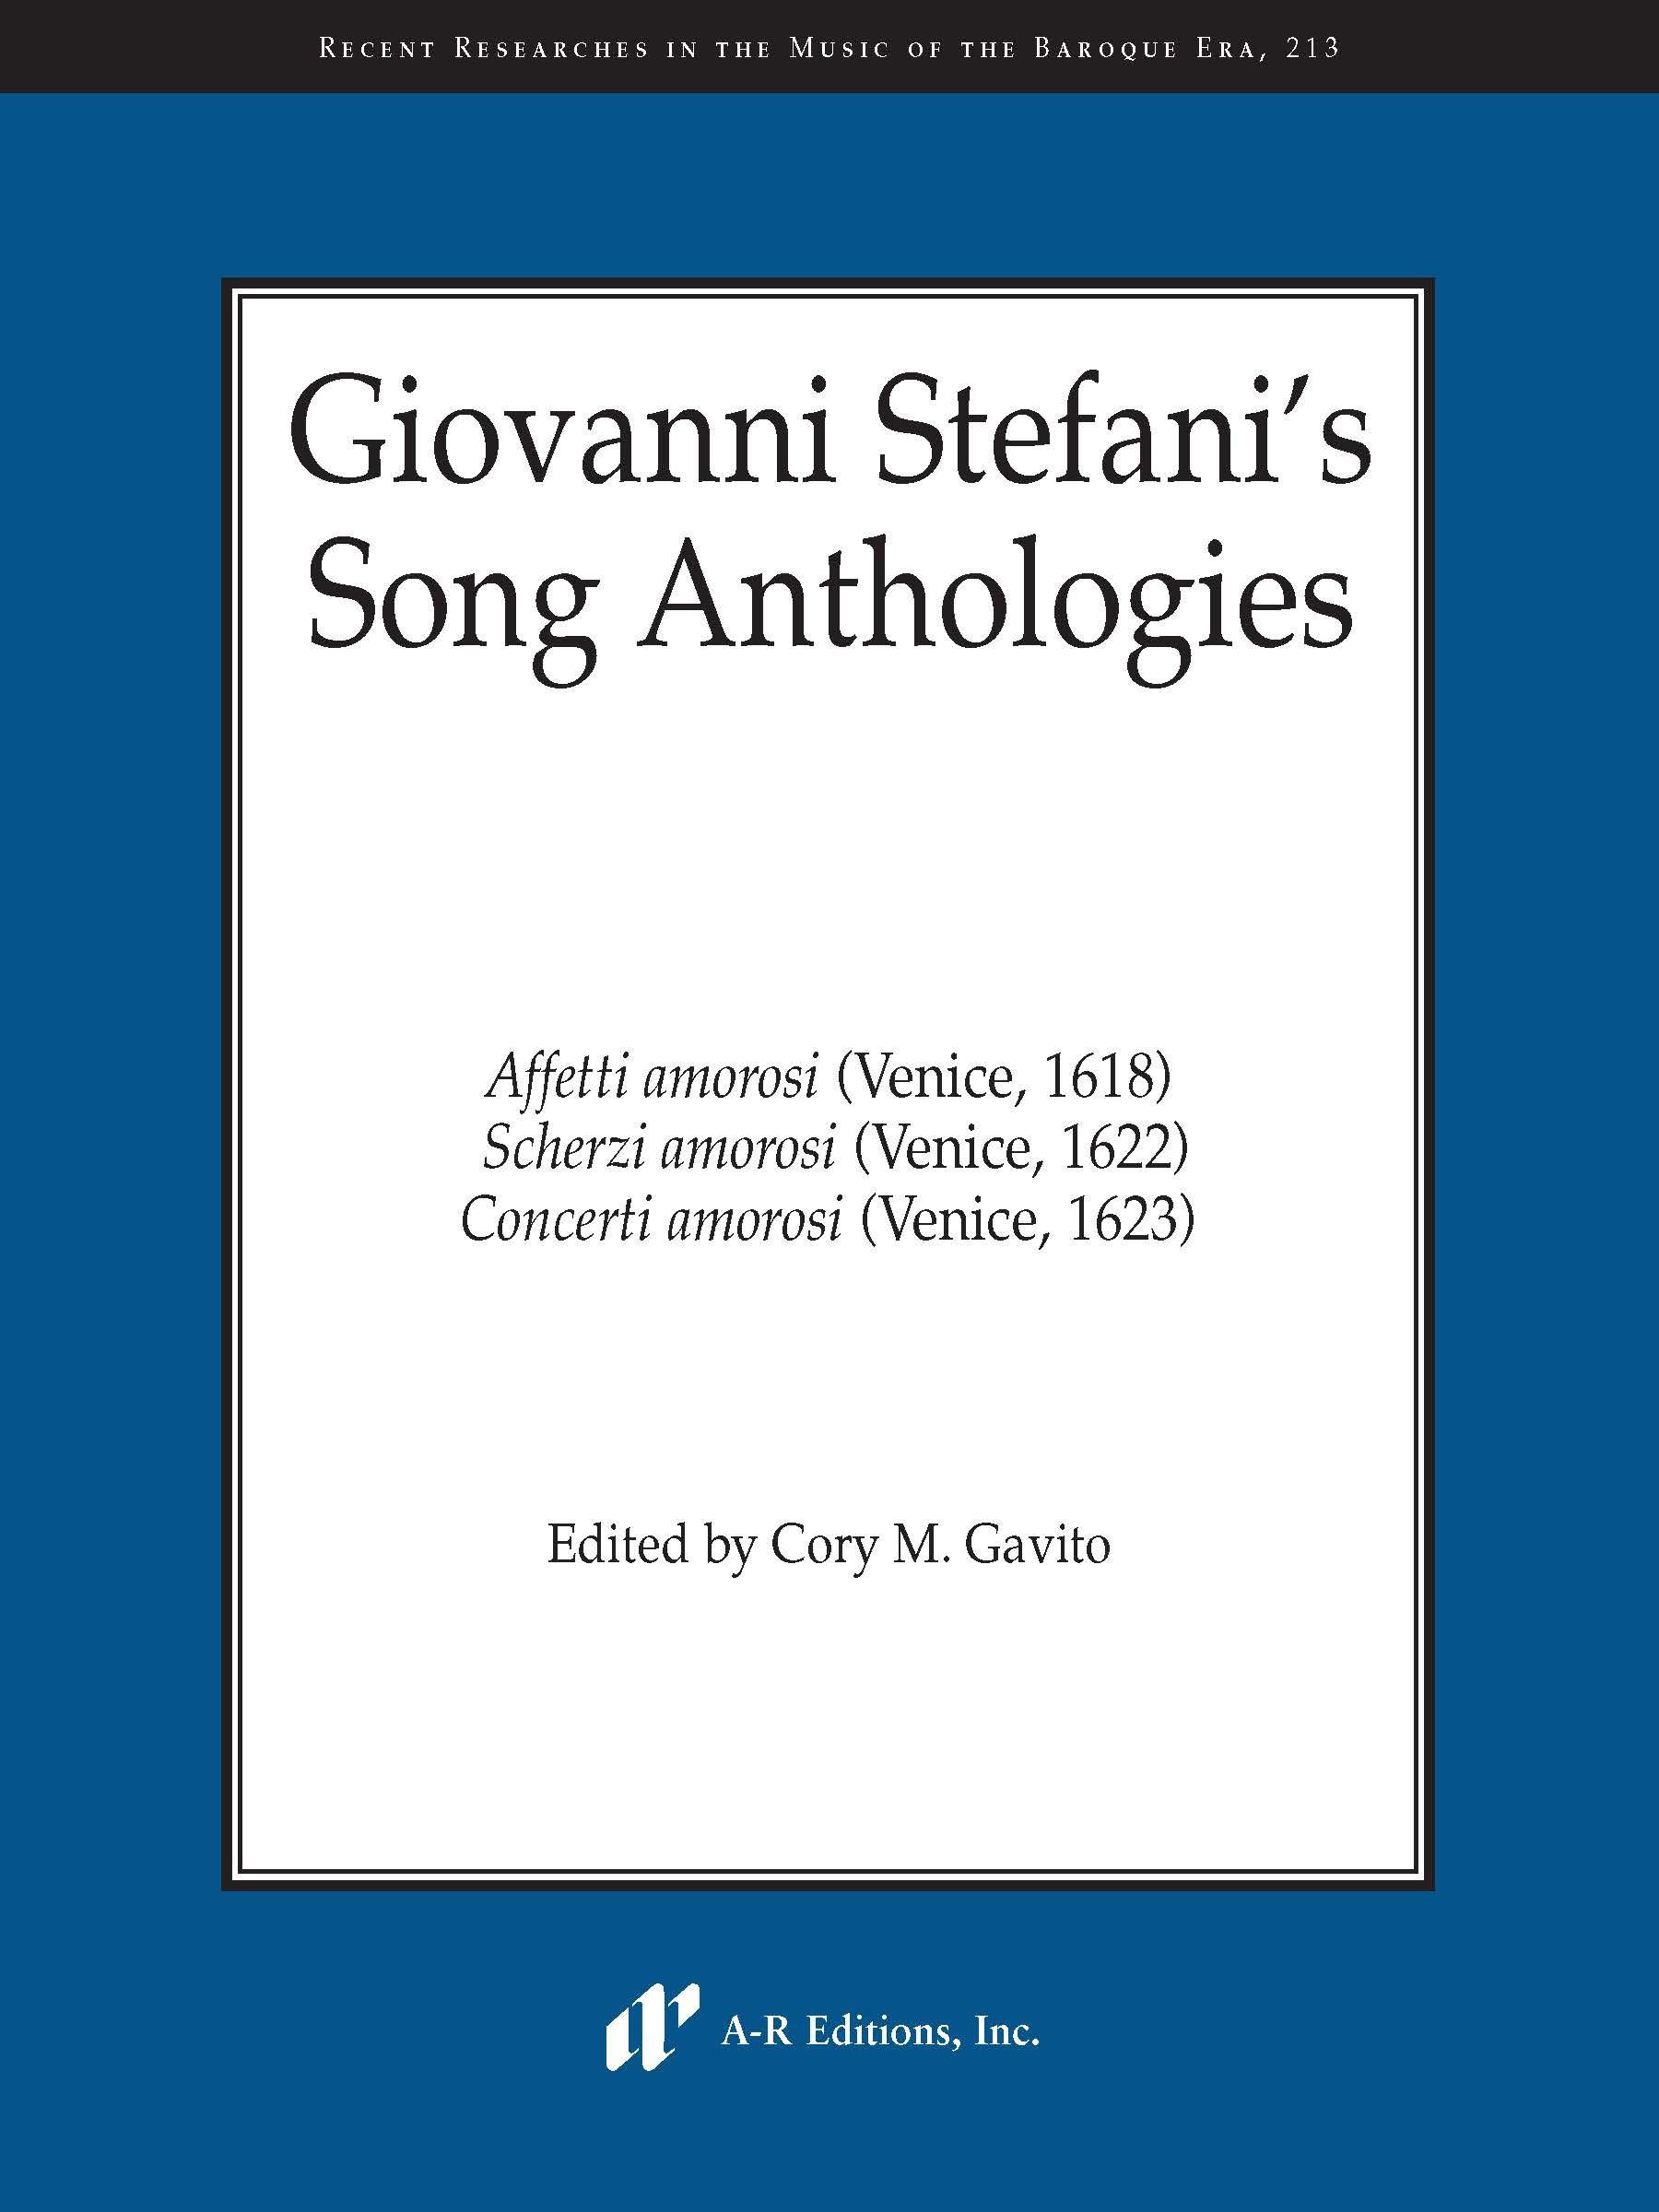 Giovanni Stefani's Song Anthologies